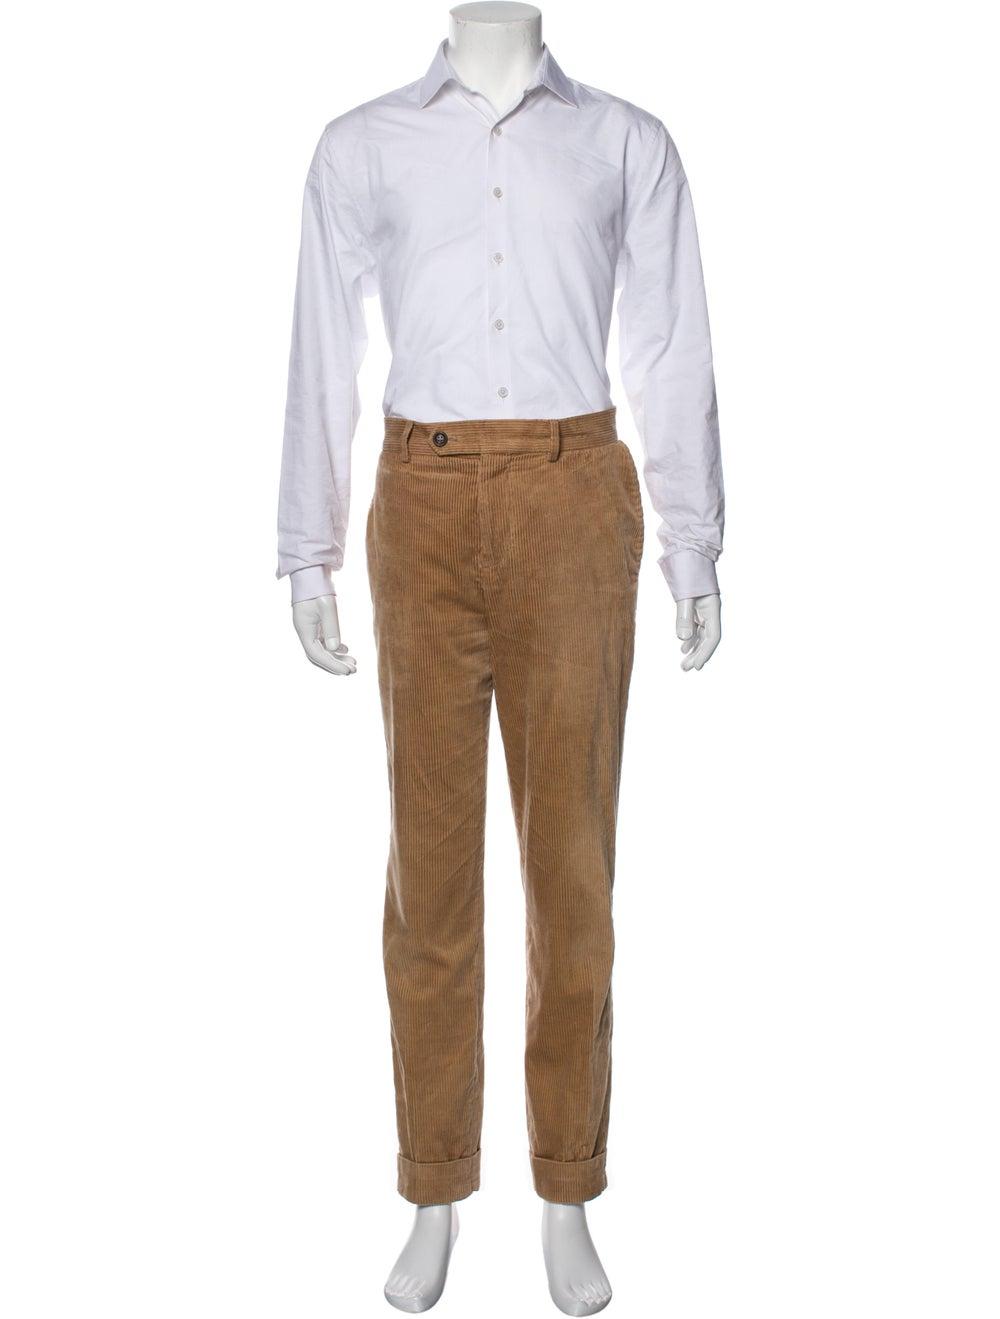 Brunello Cucinelli Two-Piece Suit - image 4